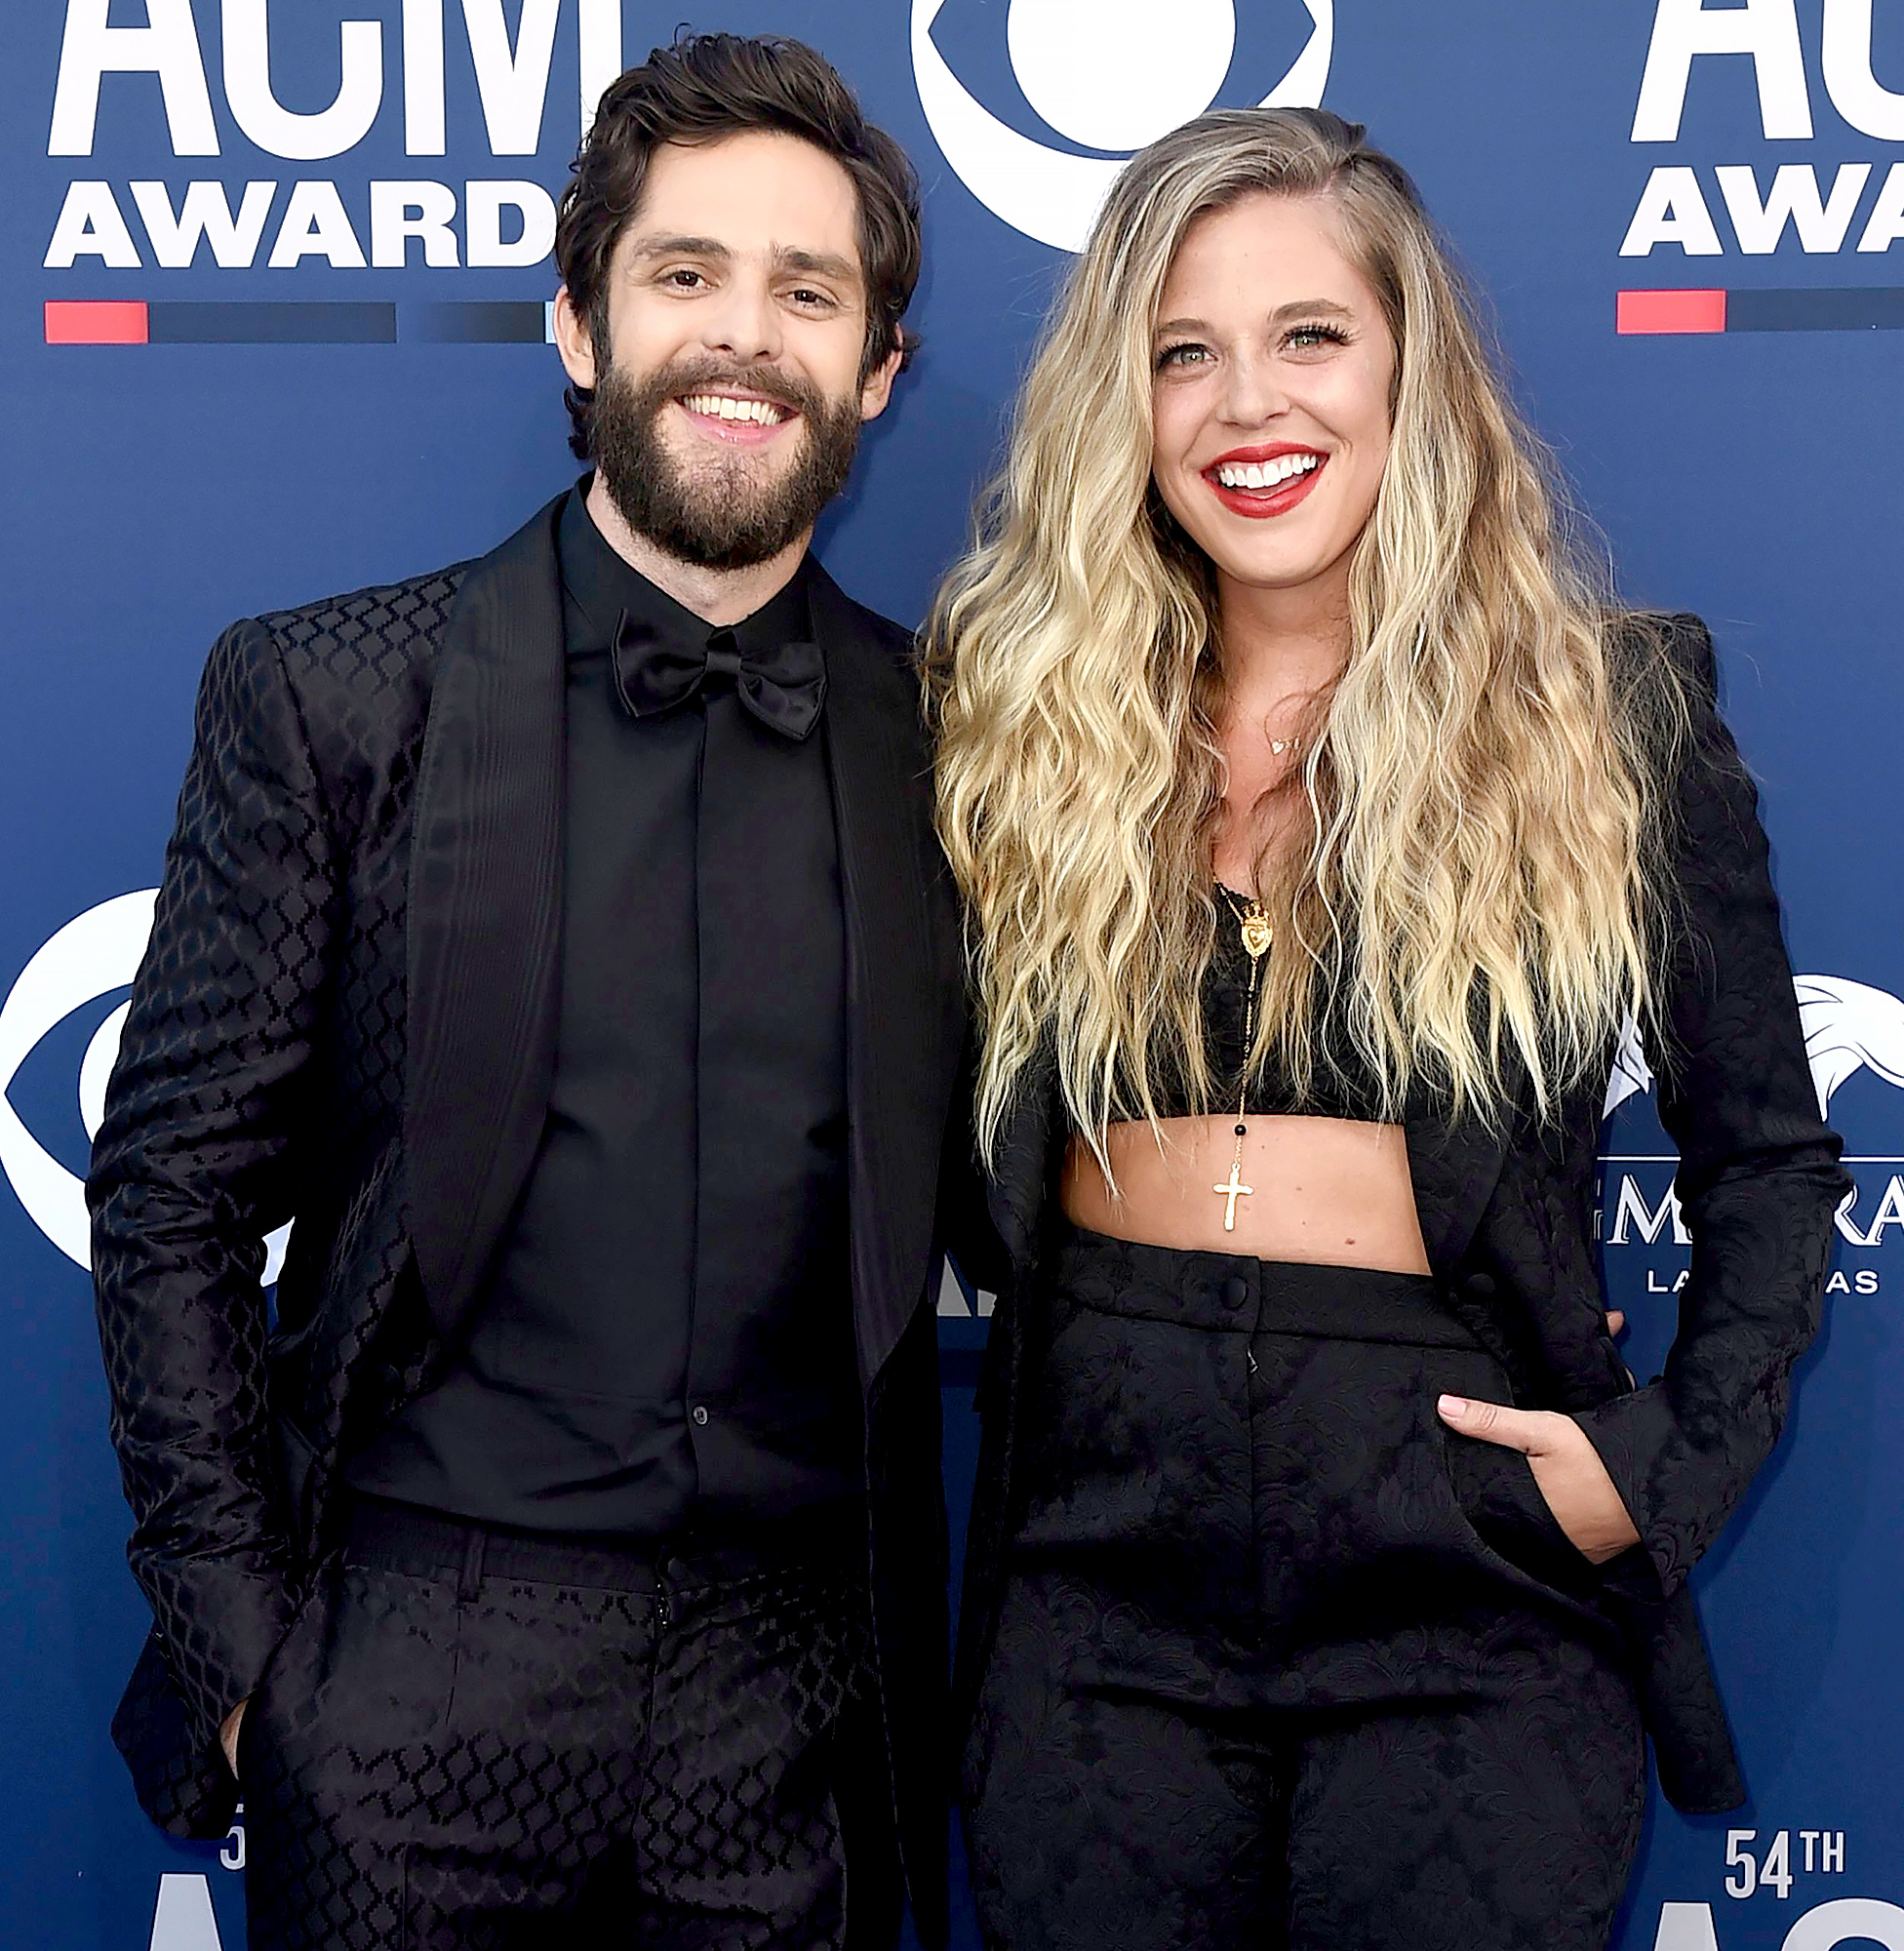 Thomas Rhett Wishes 'Beautiful' Wife Lauren Akins a Happy 31st Birthday